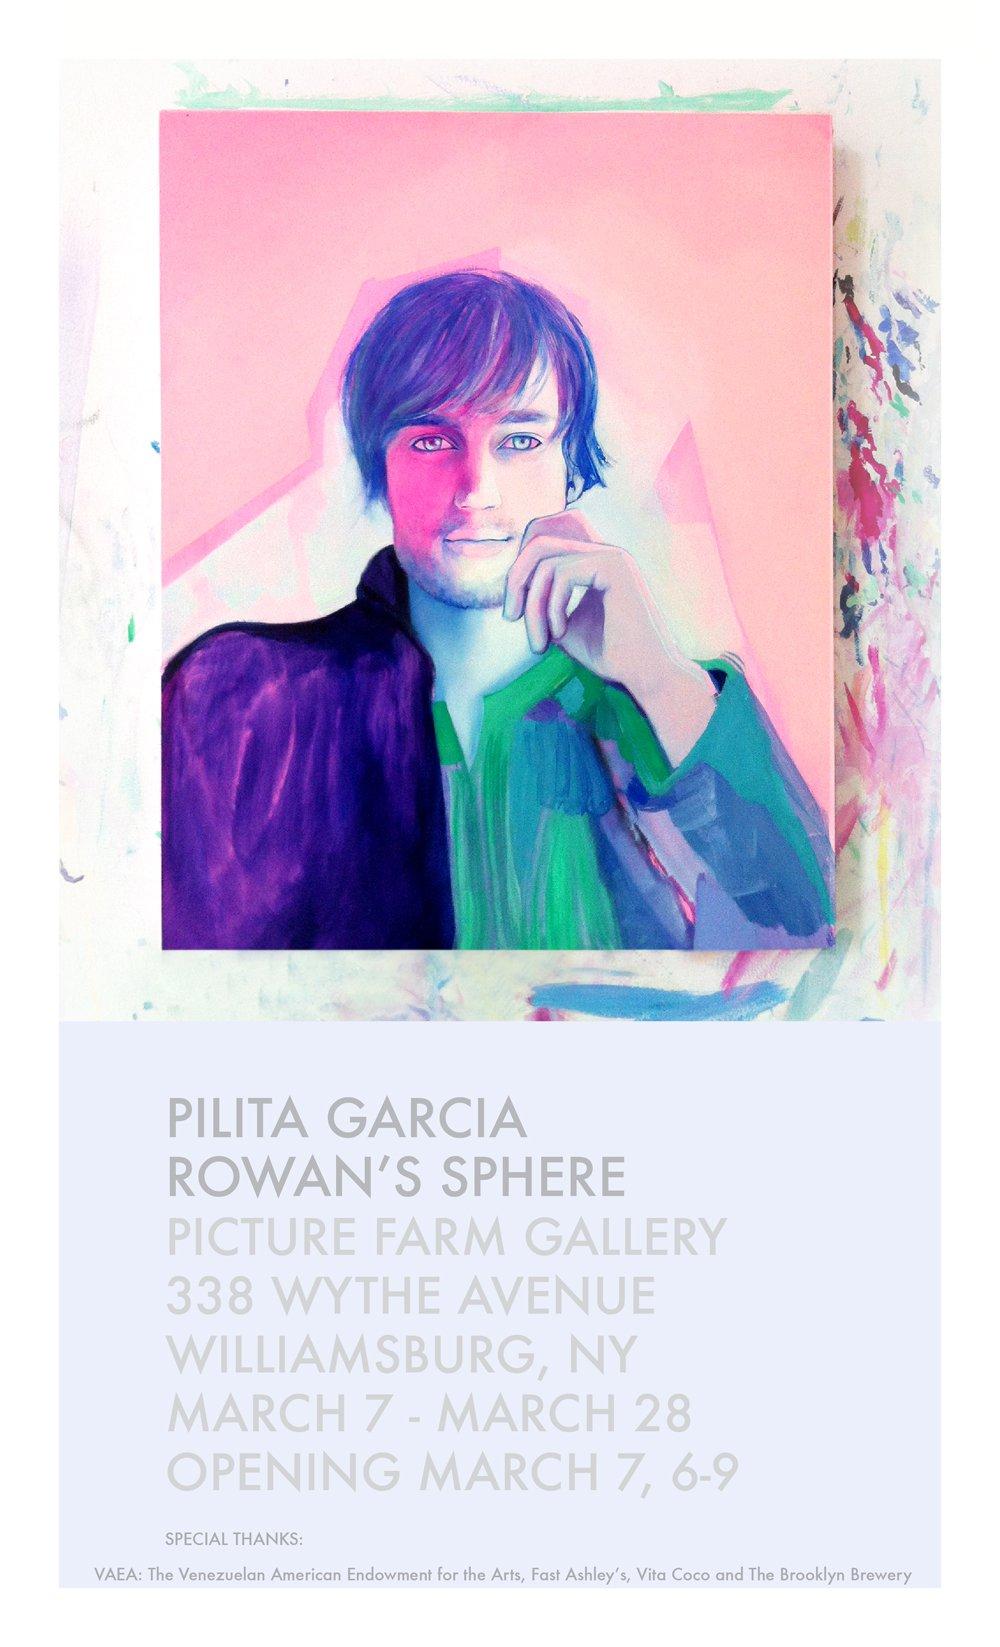 1000x1647xPilita-Garcia-Invite.jpg.pagespeed.ic.3yxHhsNqIs